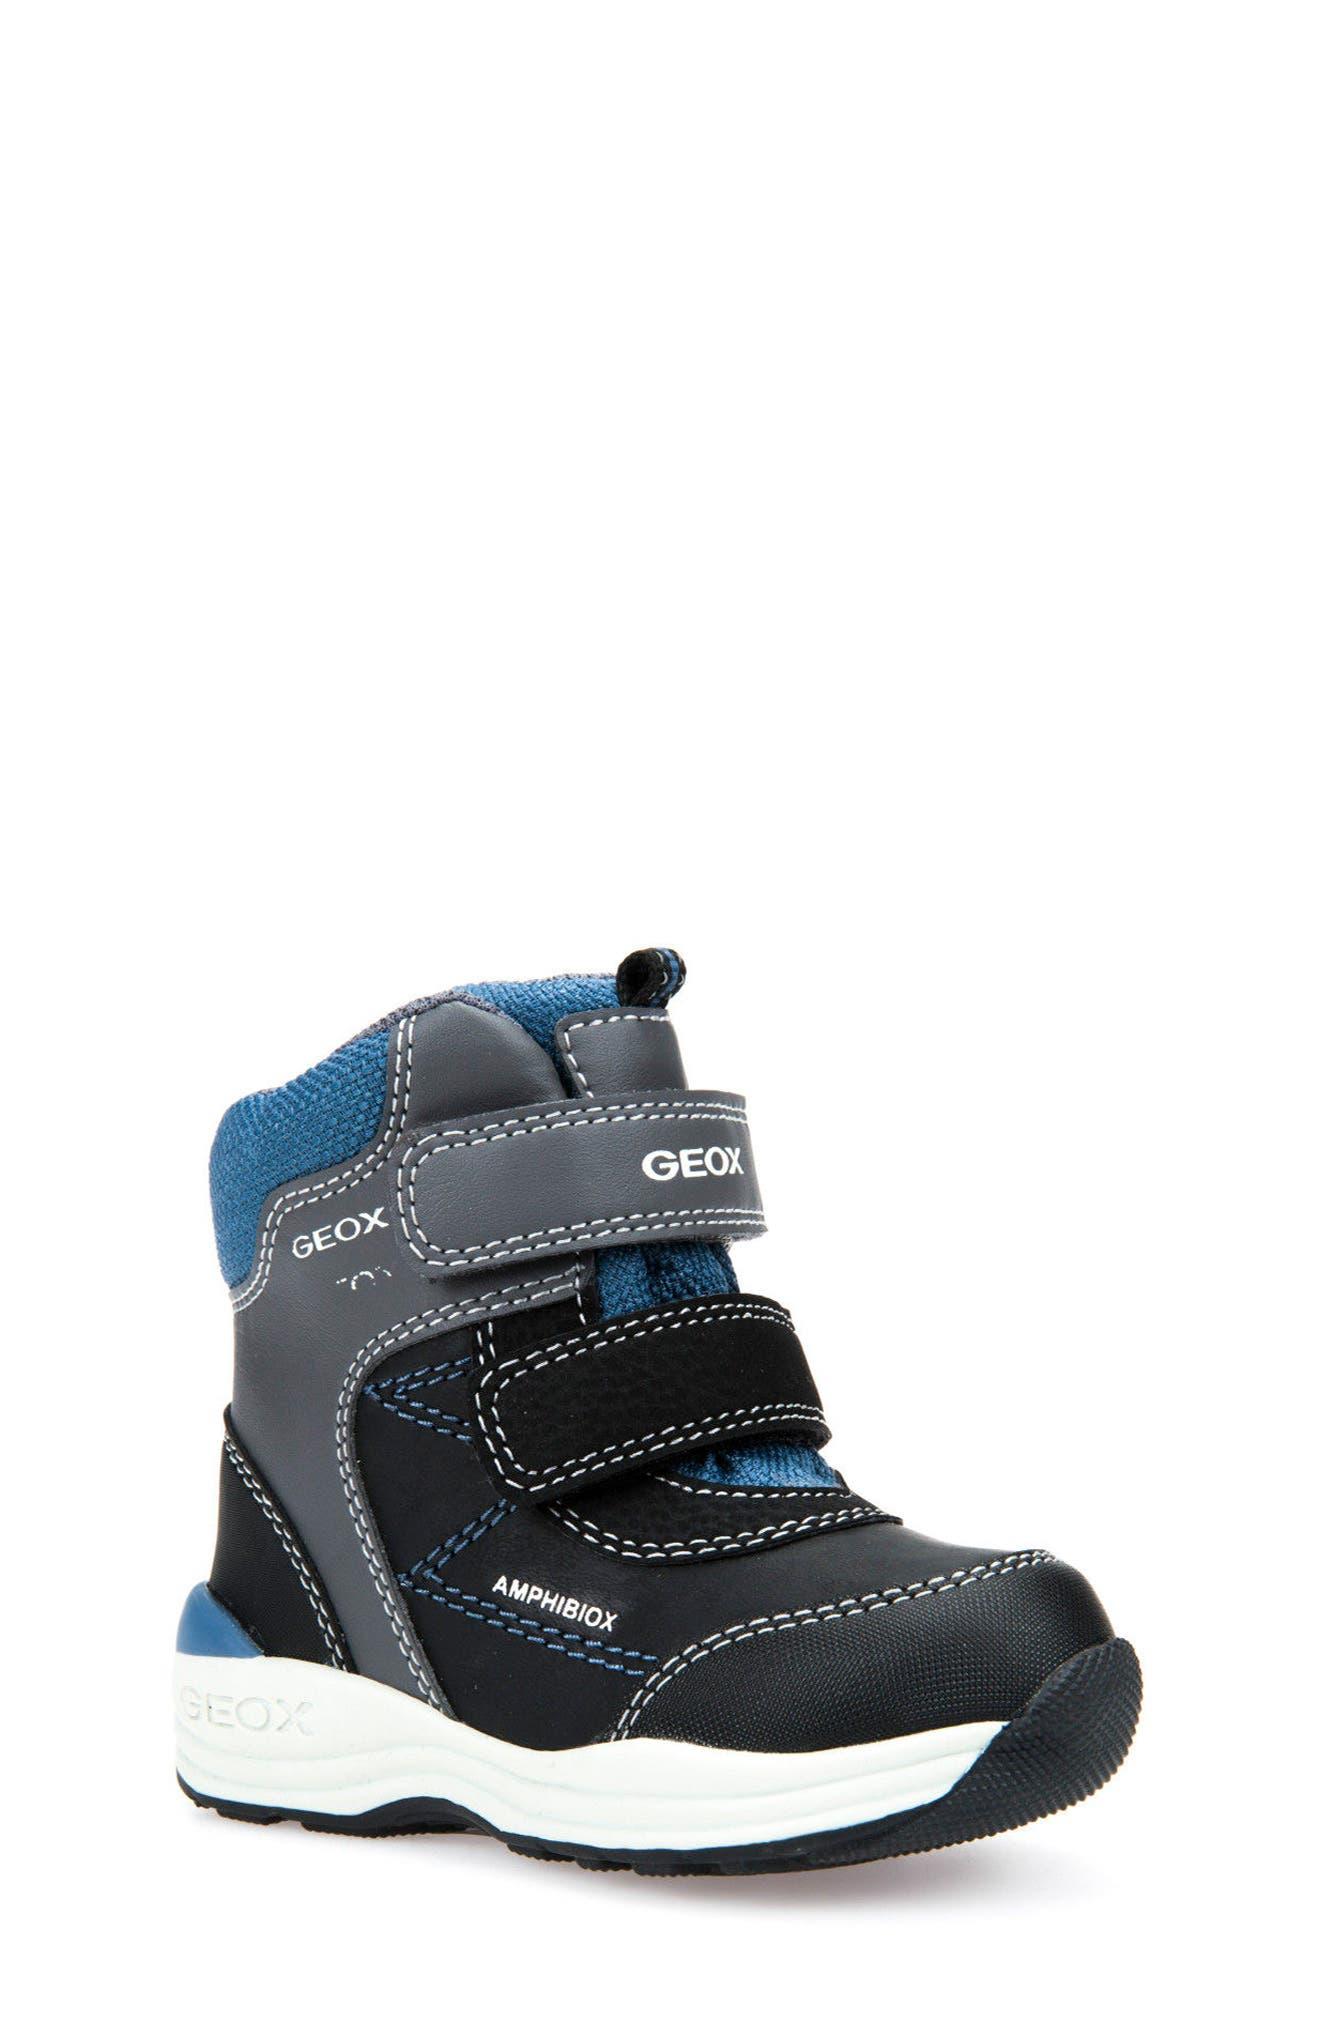 Gulp ABX Waterproof Boot,                             Main thumbnail 1, color,                             071